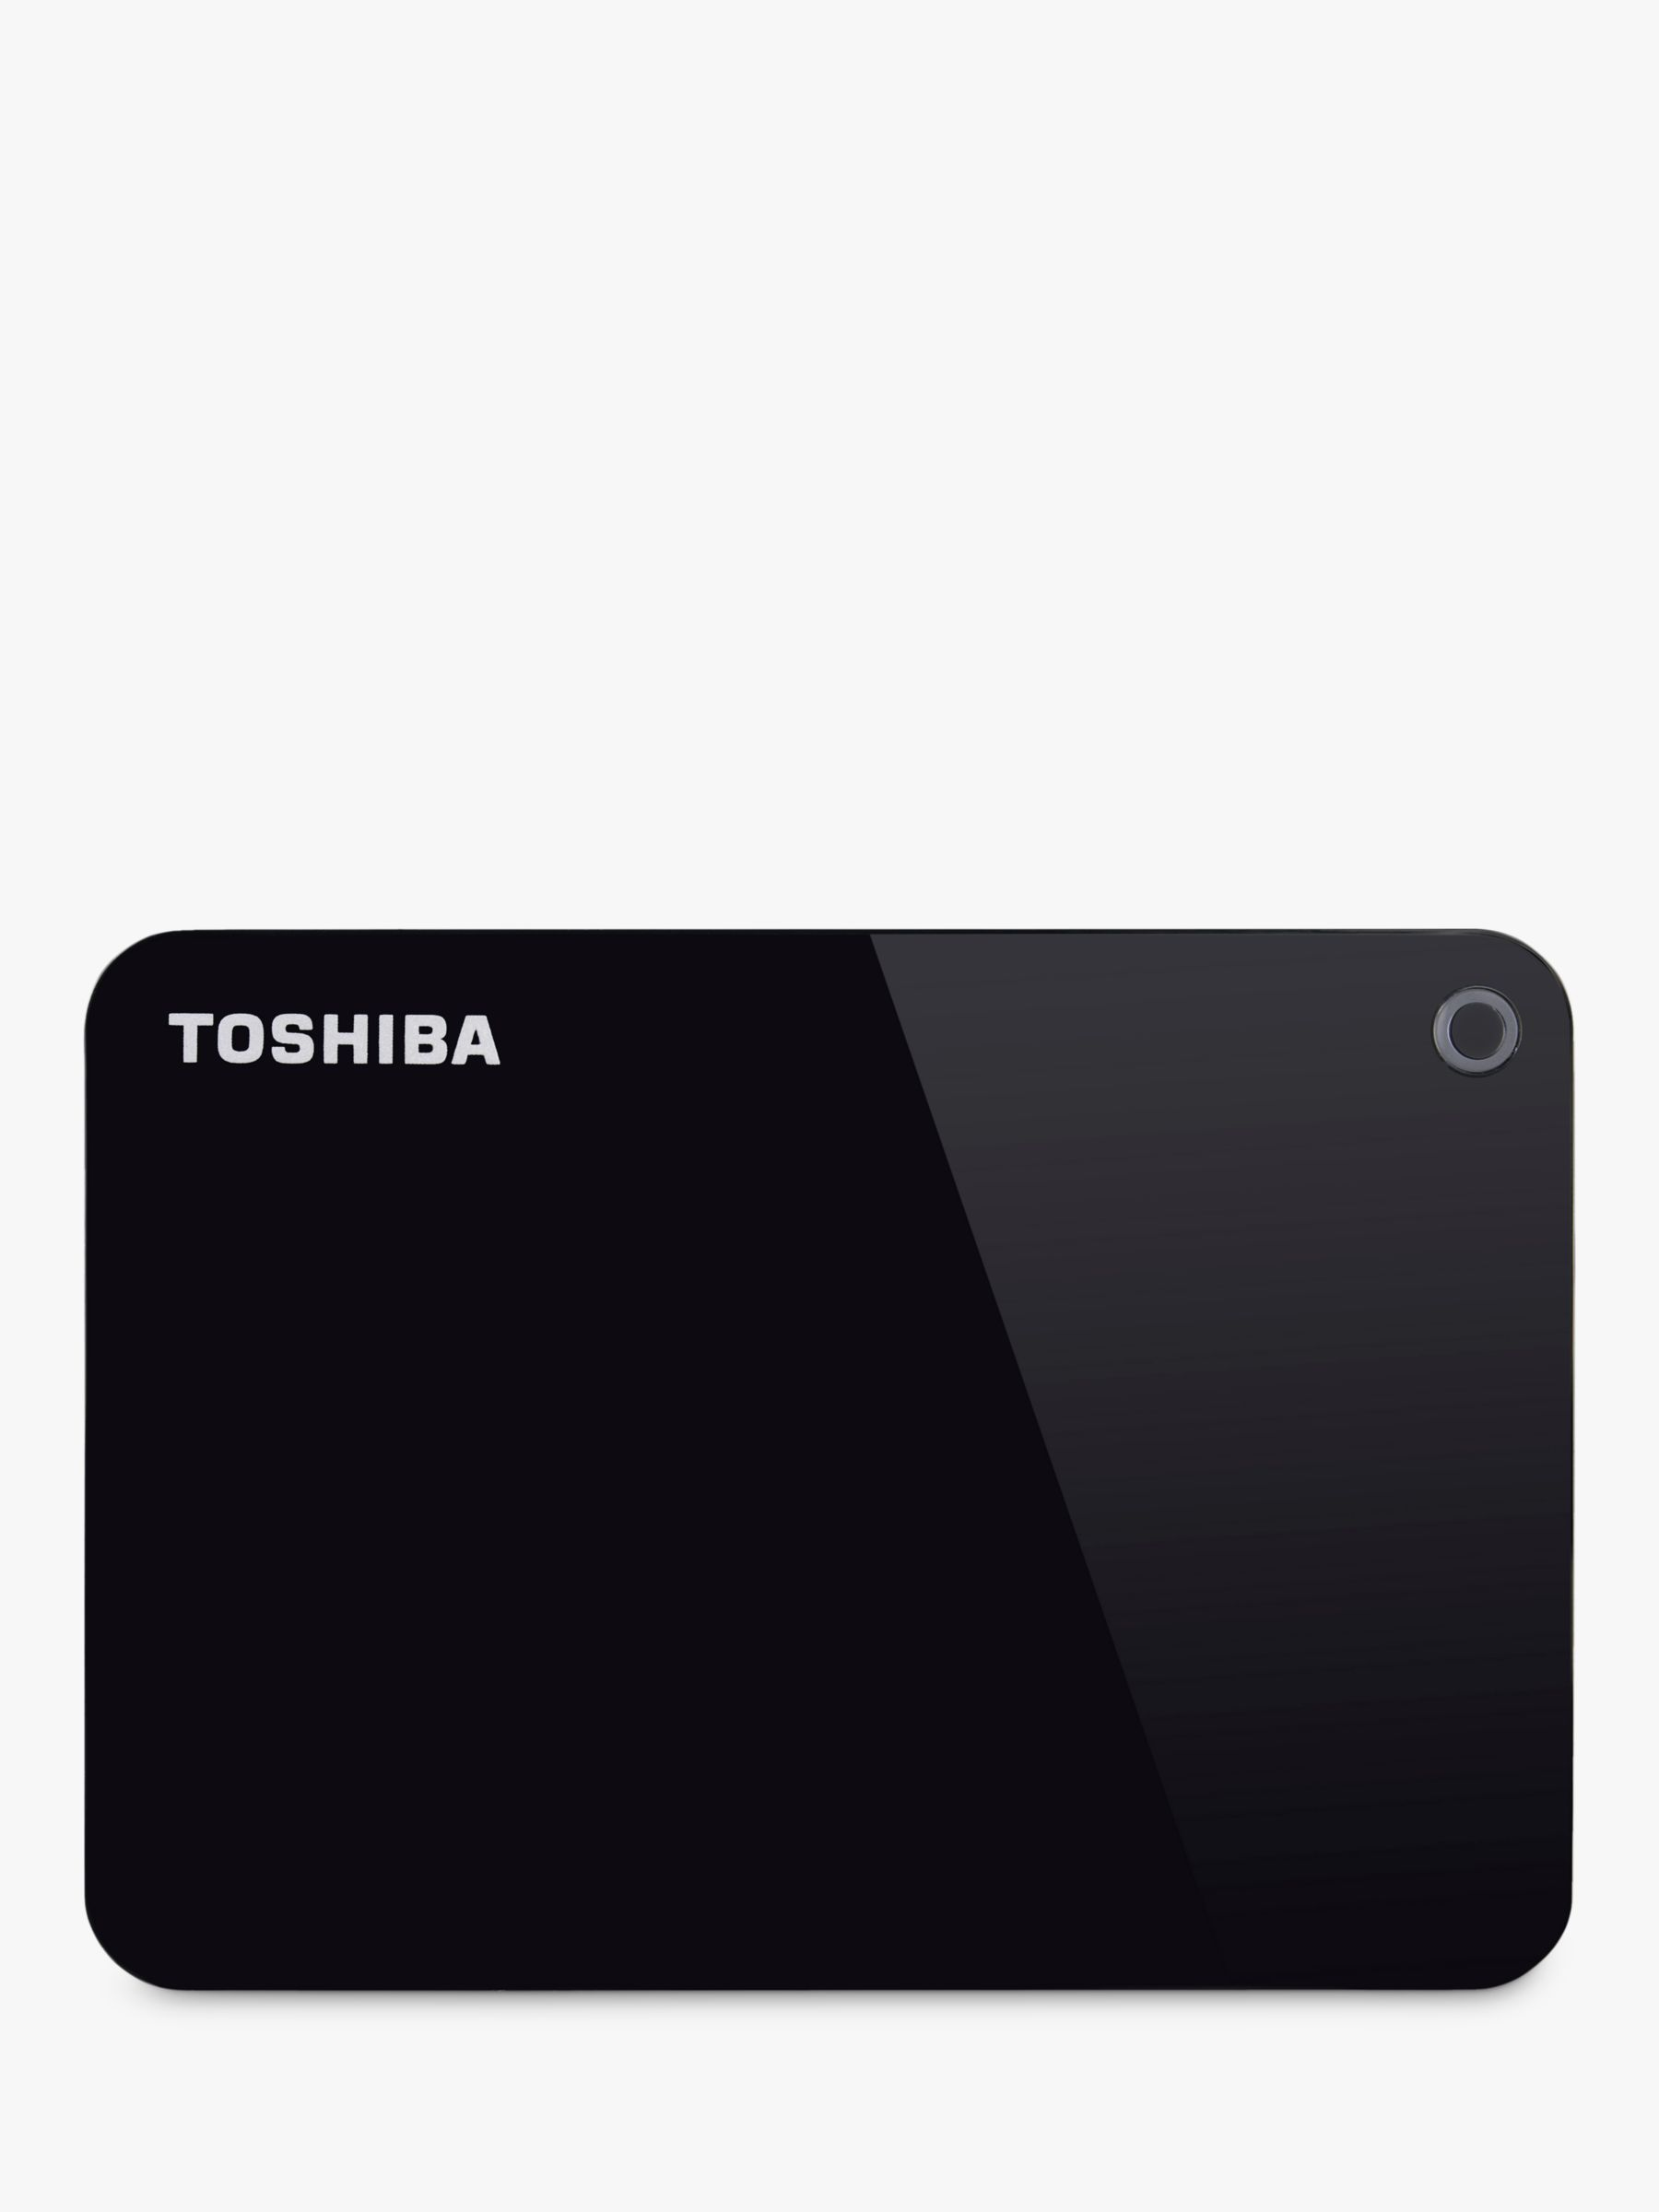 Toshiba Toshiba Canvio Advance, Portable Hard Drive, USB 3.0, 2TB